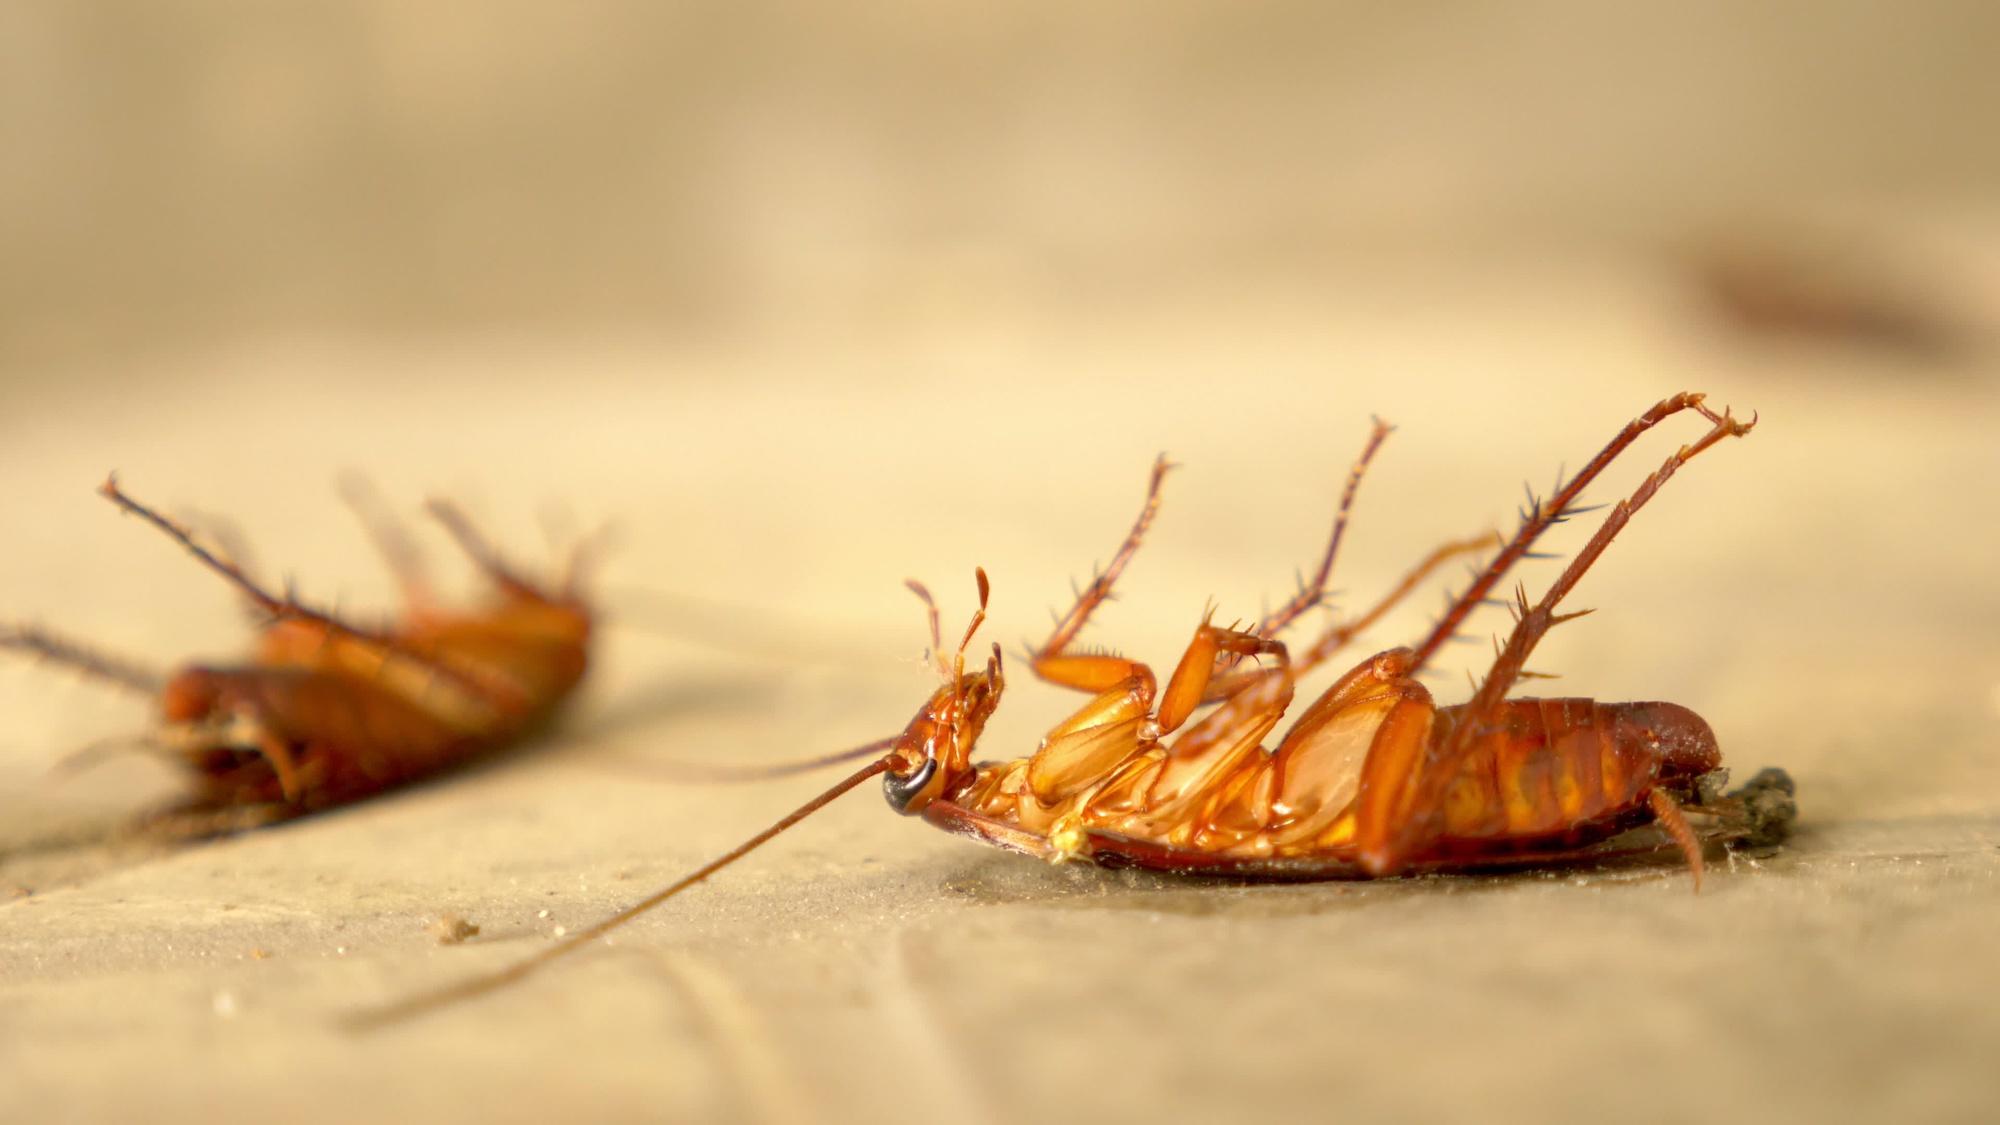 Cockroach pest control in Bakersfield, Bakersfield pest control